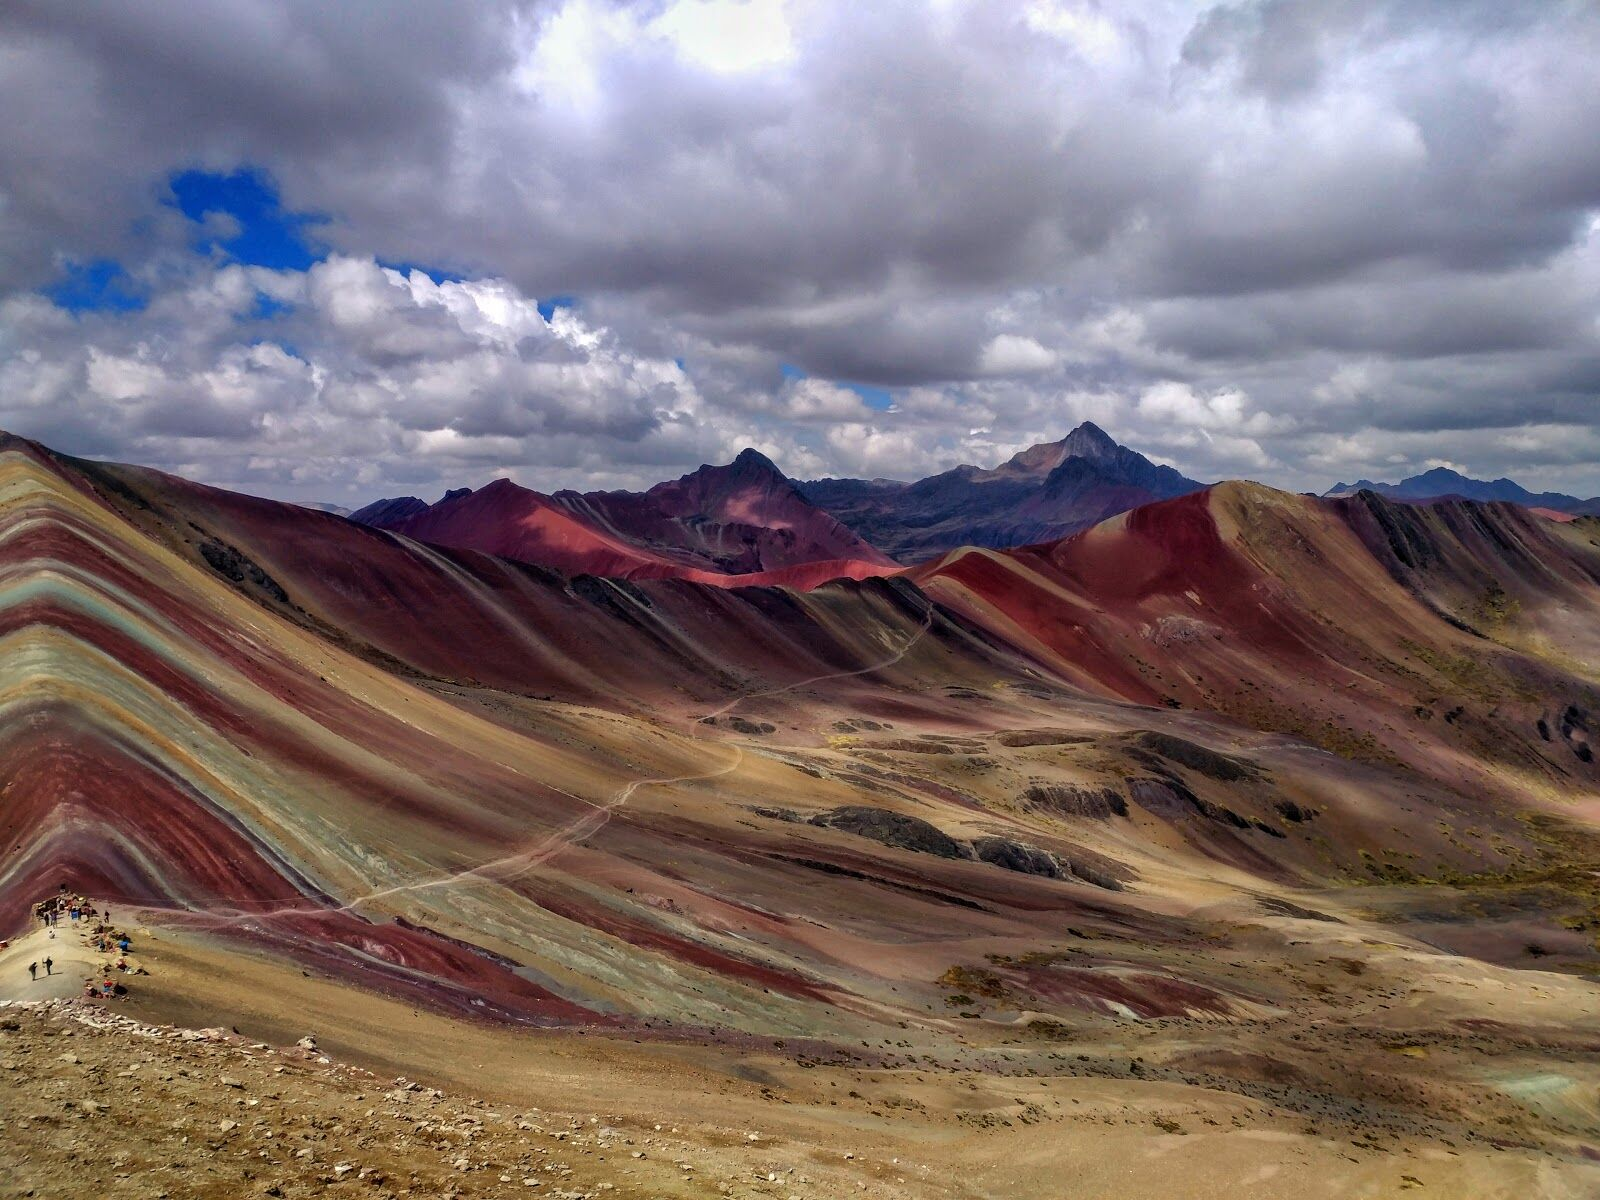 Гора-радуга, Перу. 5 200 м